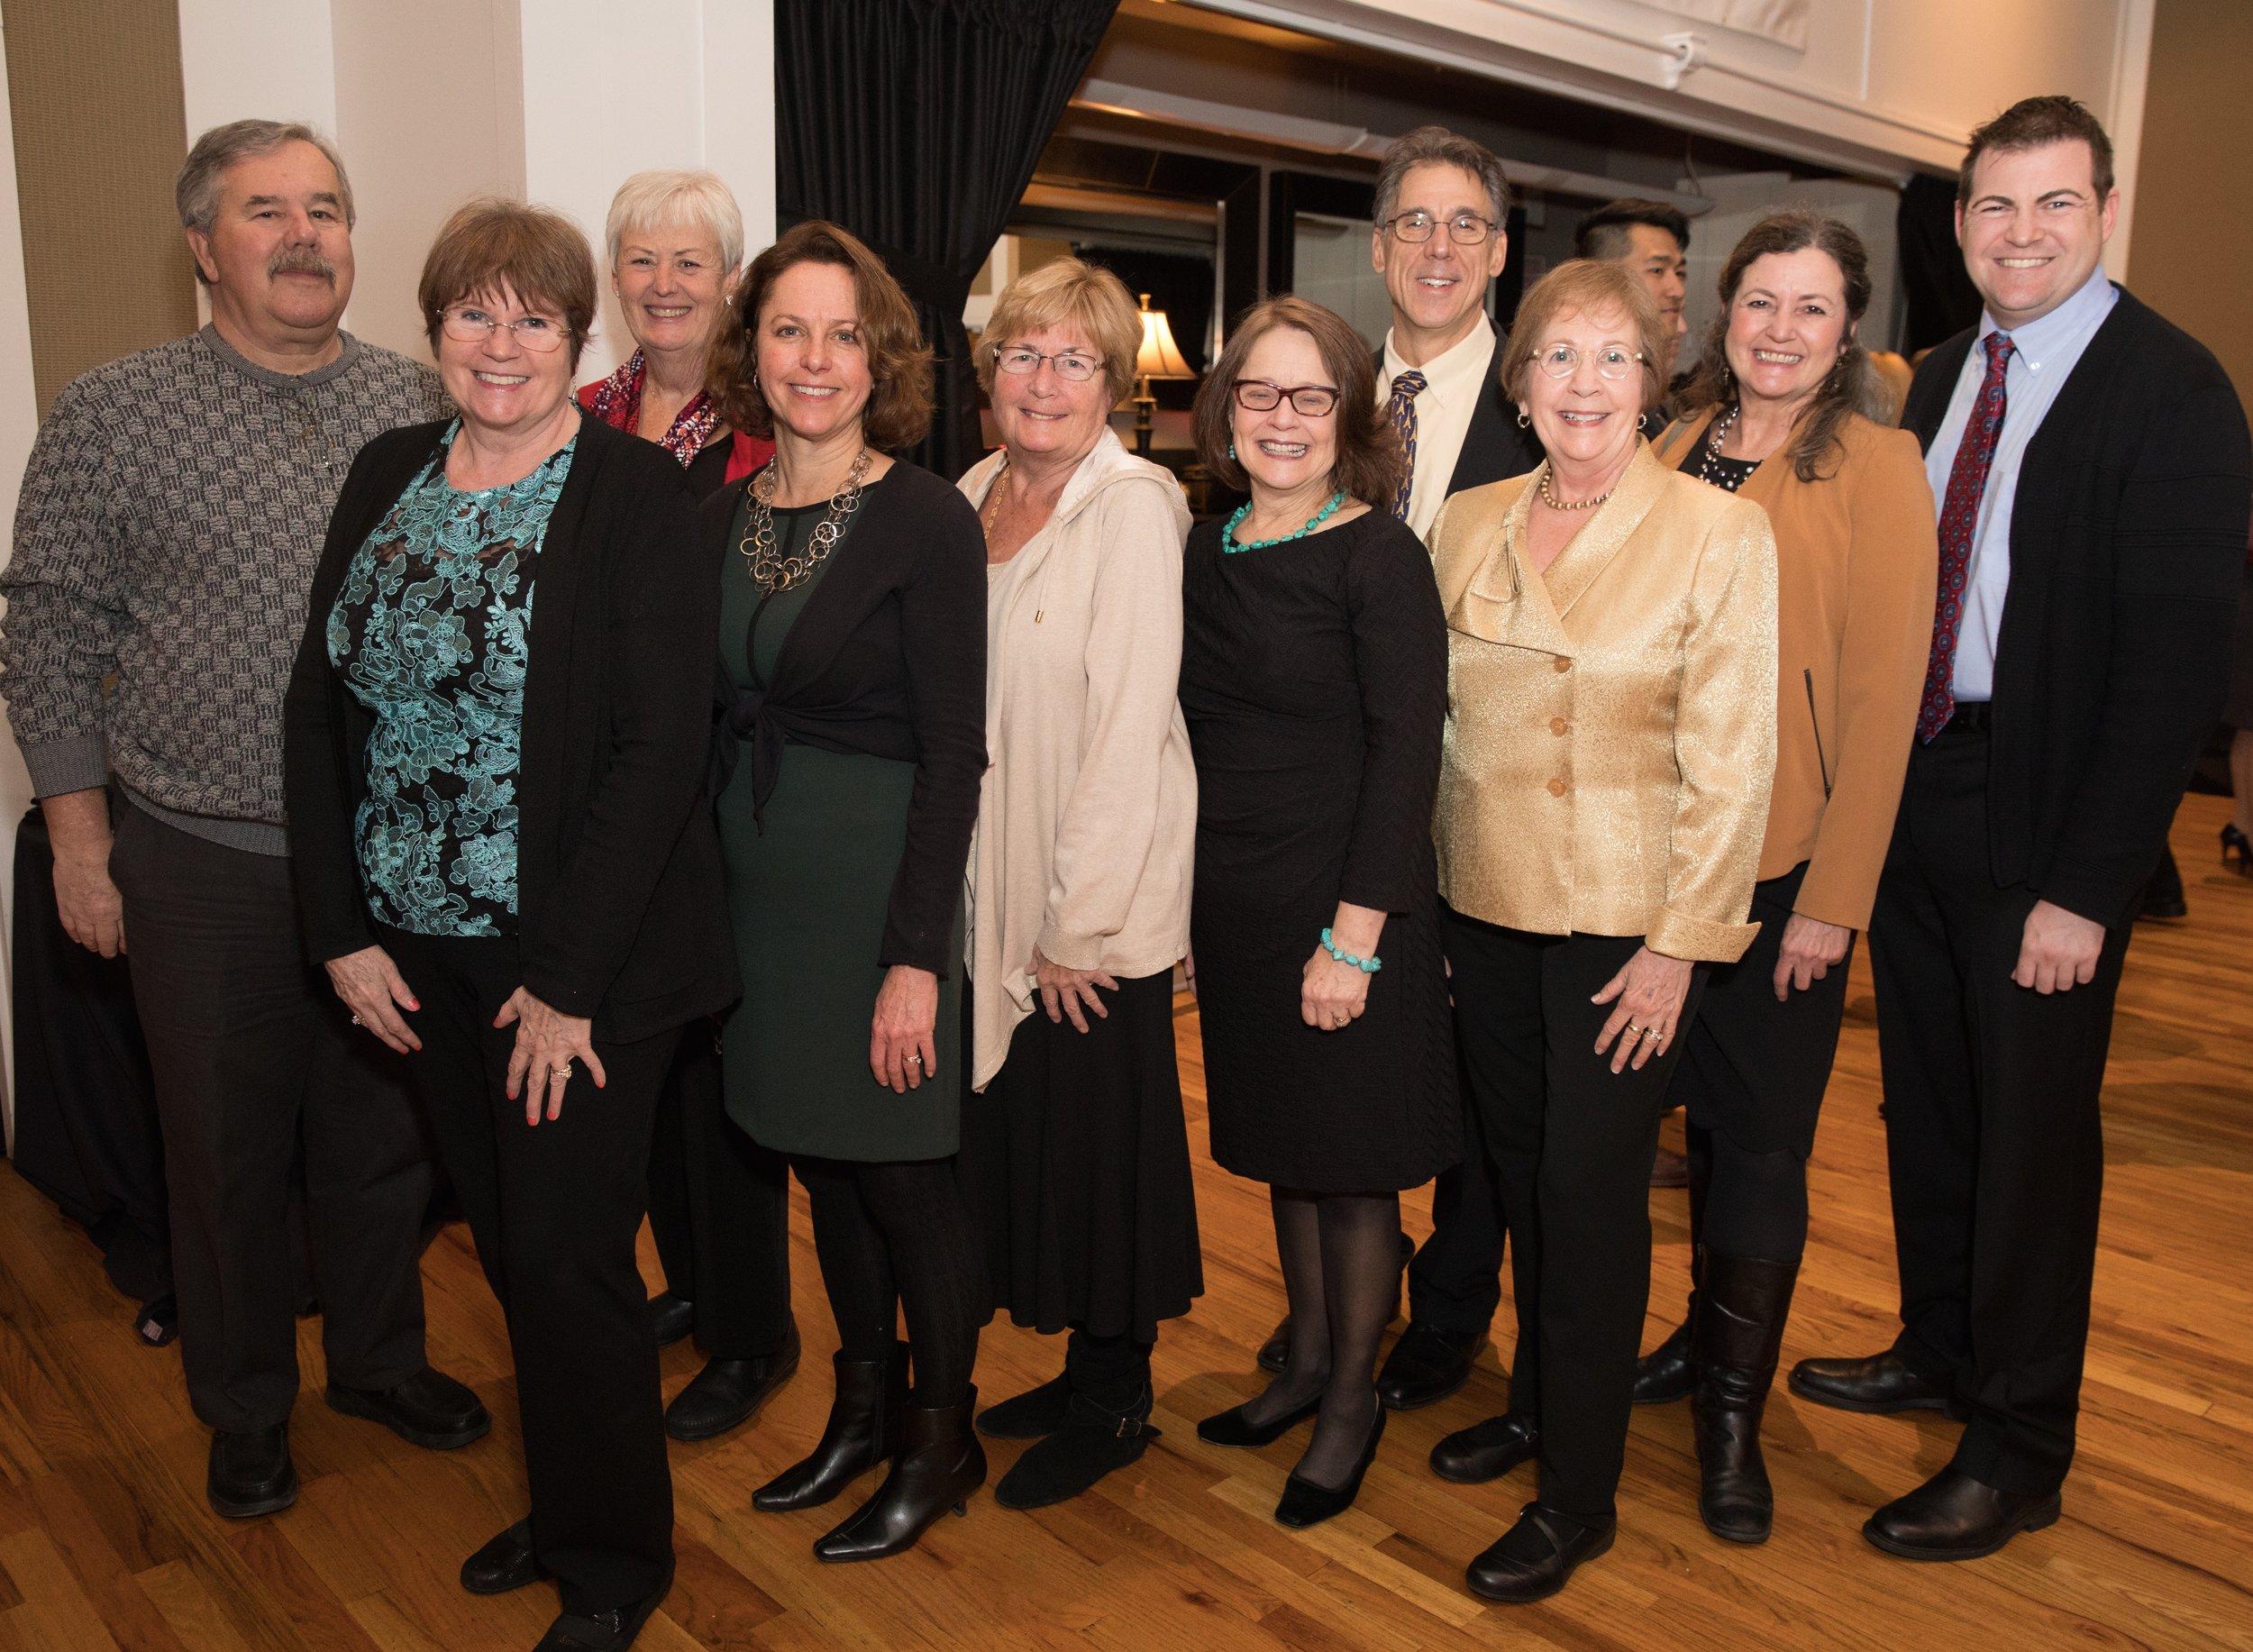 Barbara wins the 2017 Margaret Bancroft Distinguished Leadership Award!  With (left to right) Jack Kenney, Emily Iland, Pat Kenney, Linda Tortorelli, Cele Norris, Ann Osterling, Dave Bonnan, Barbara, Jean Doyle, and Tom Iland.